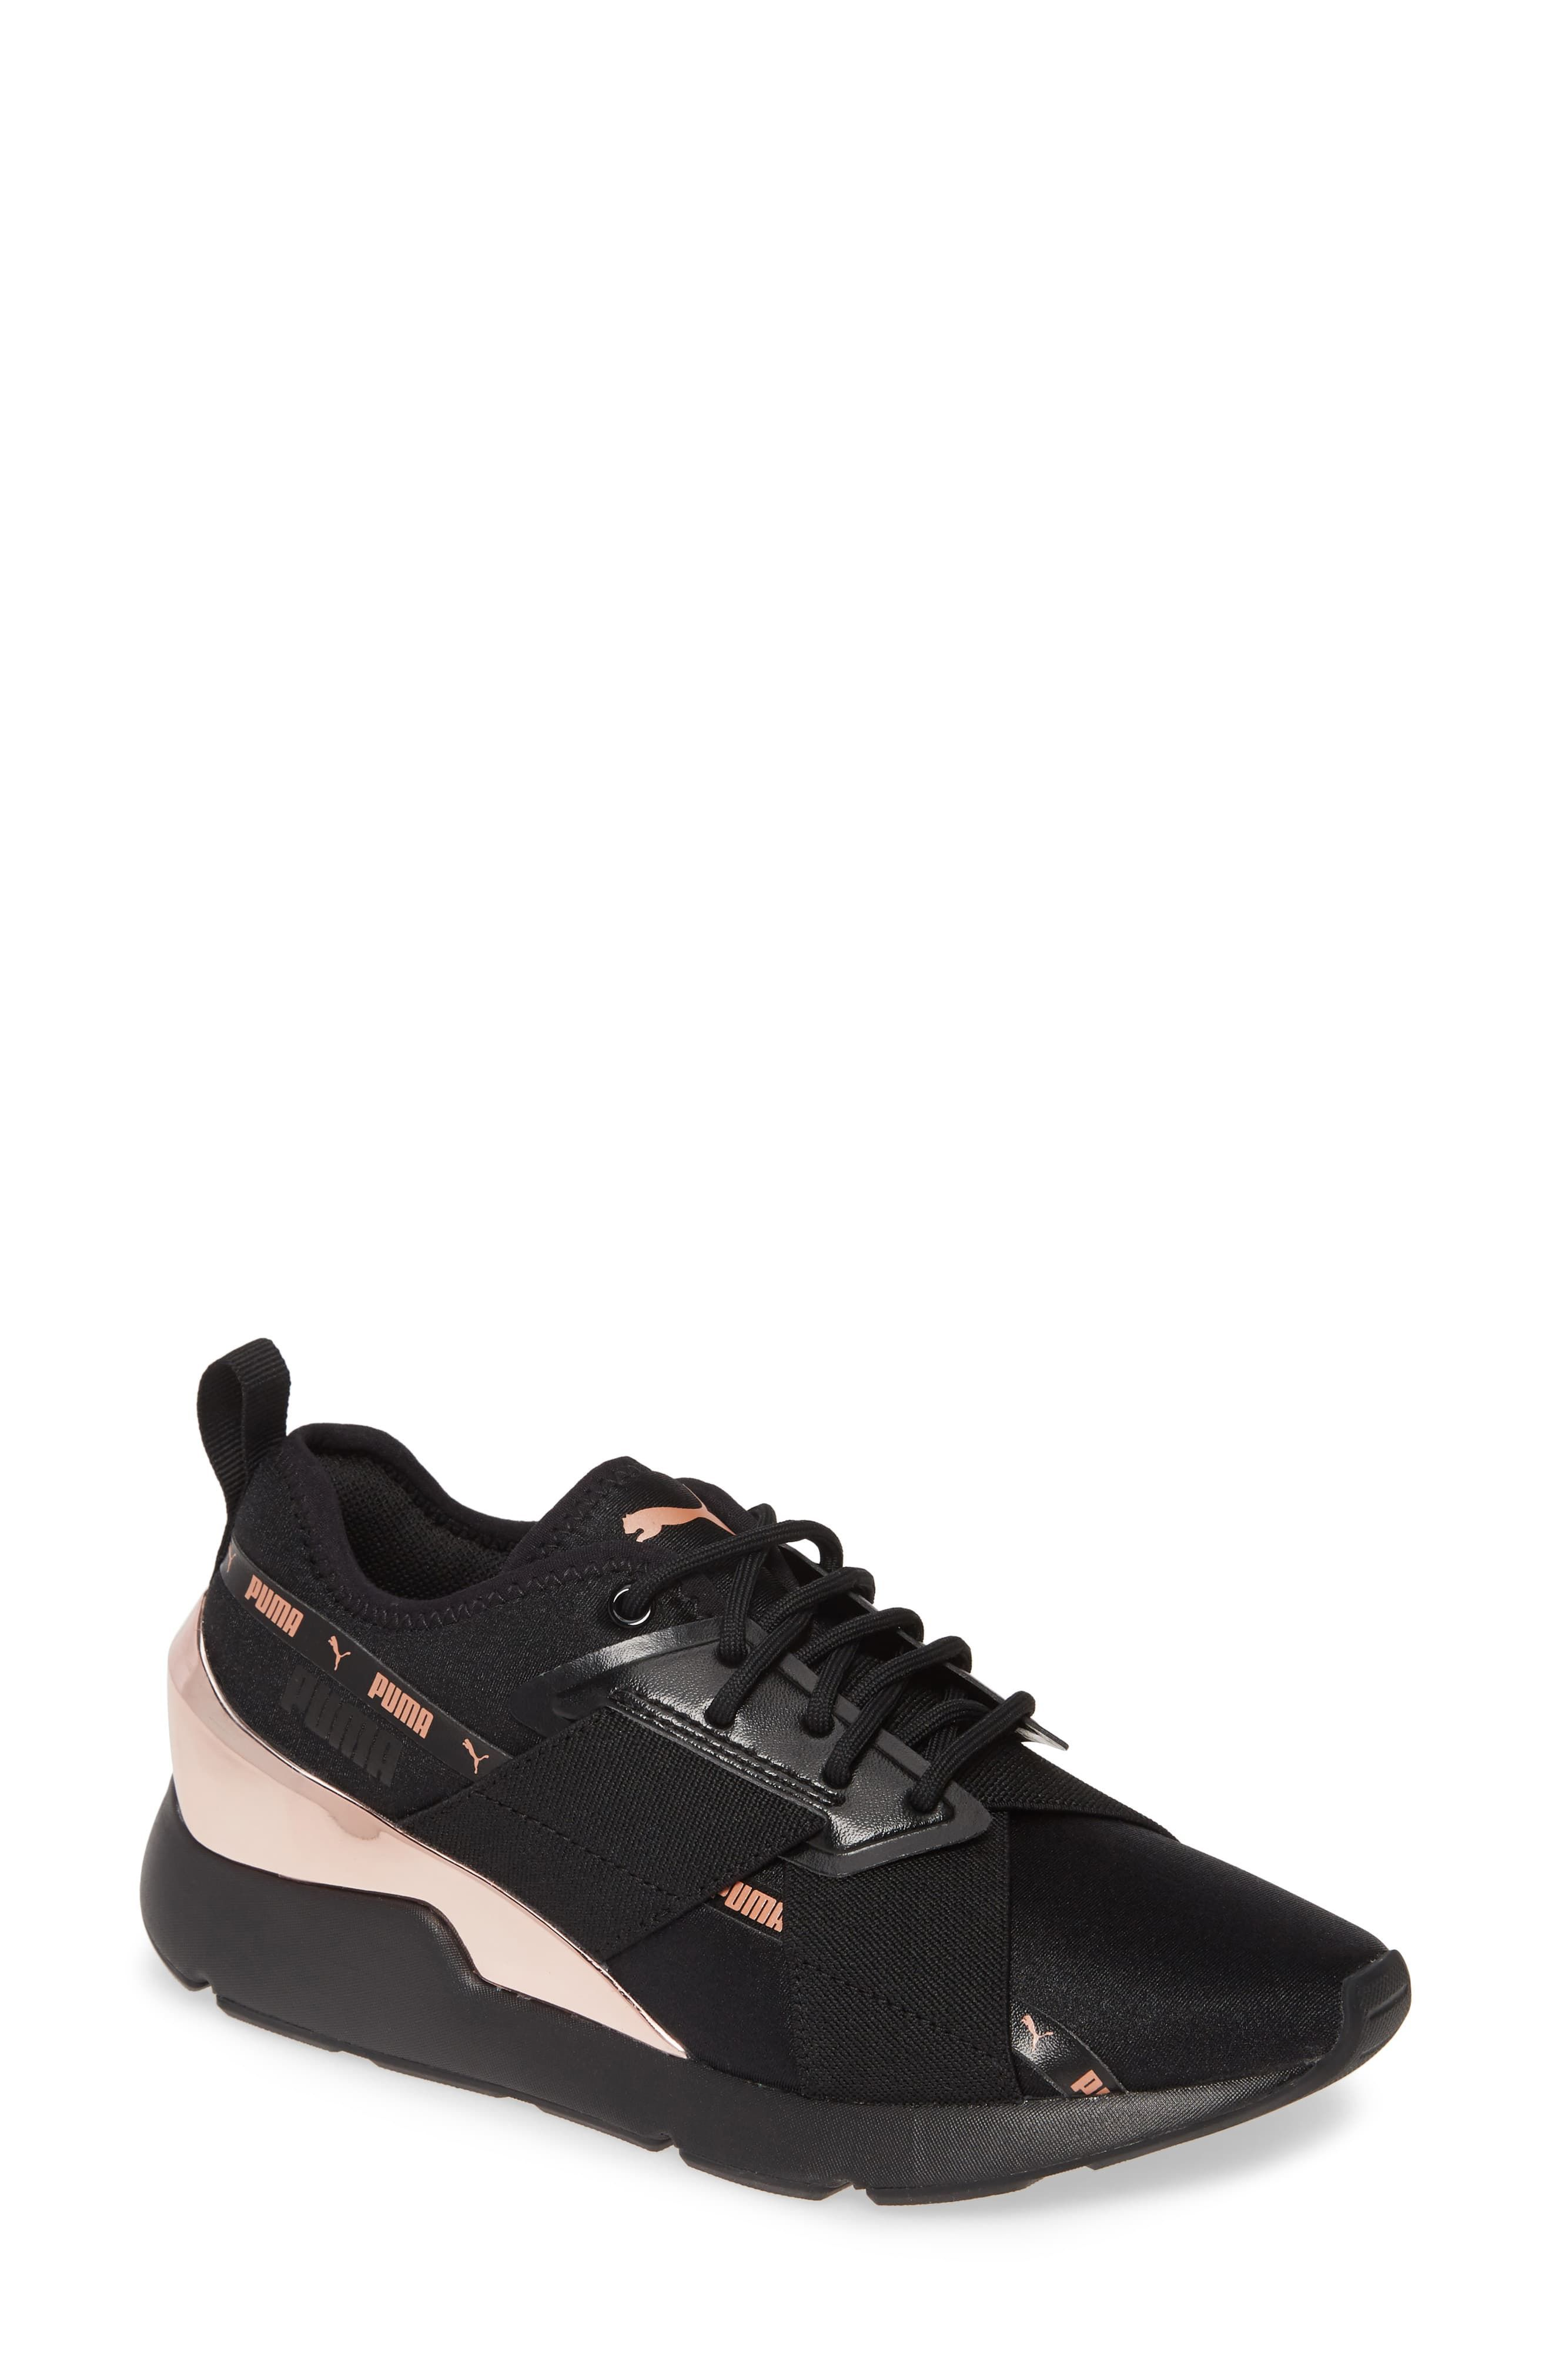 PUMA Muse X-2 Metallic Sneaker (Women